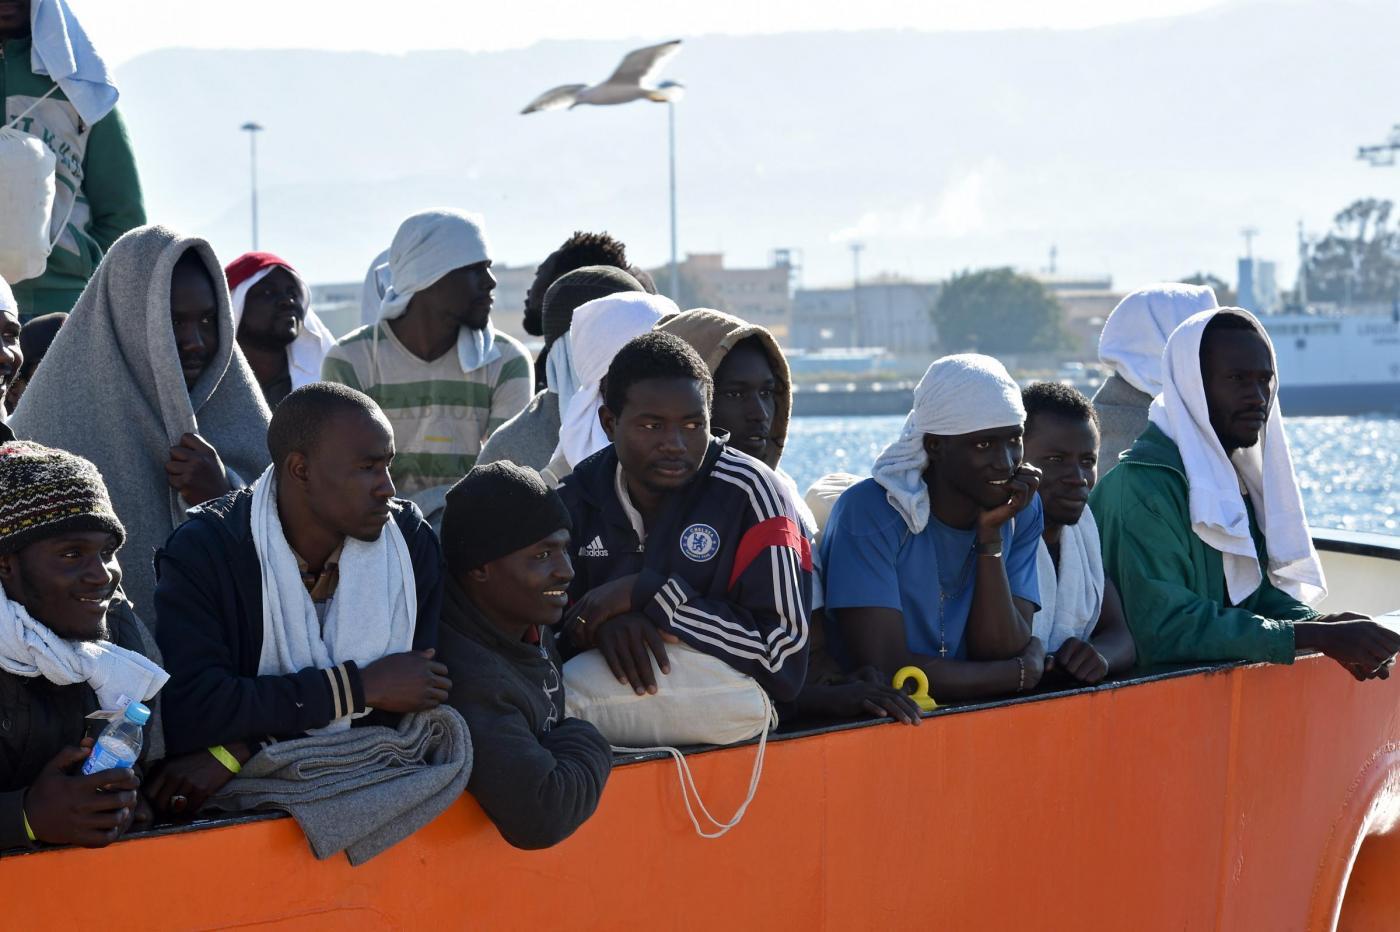 Migranti, nave Aquarius SOS Mediterranee arriva nel porto di Messina